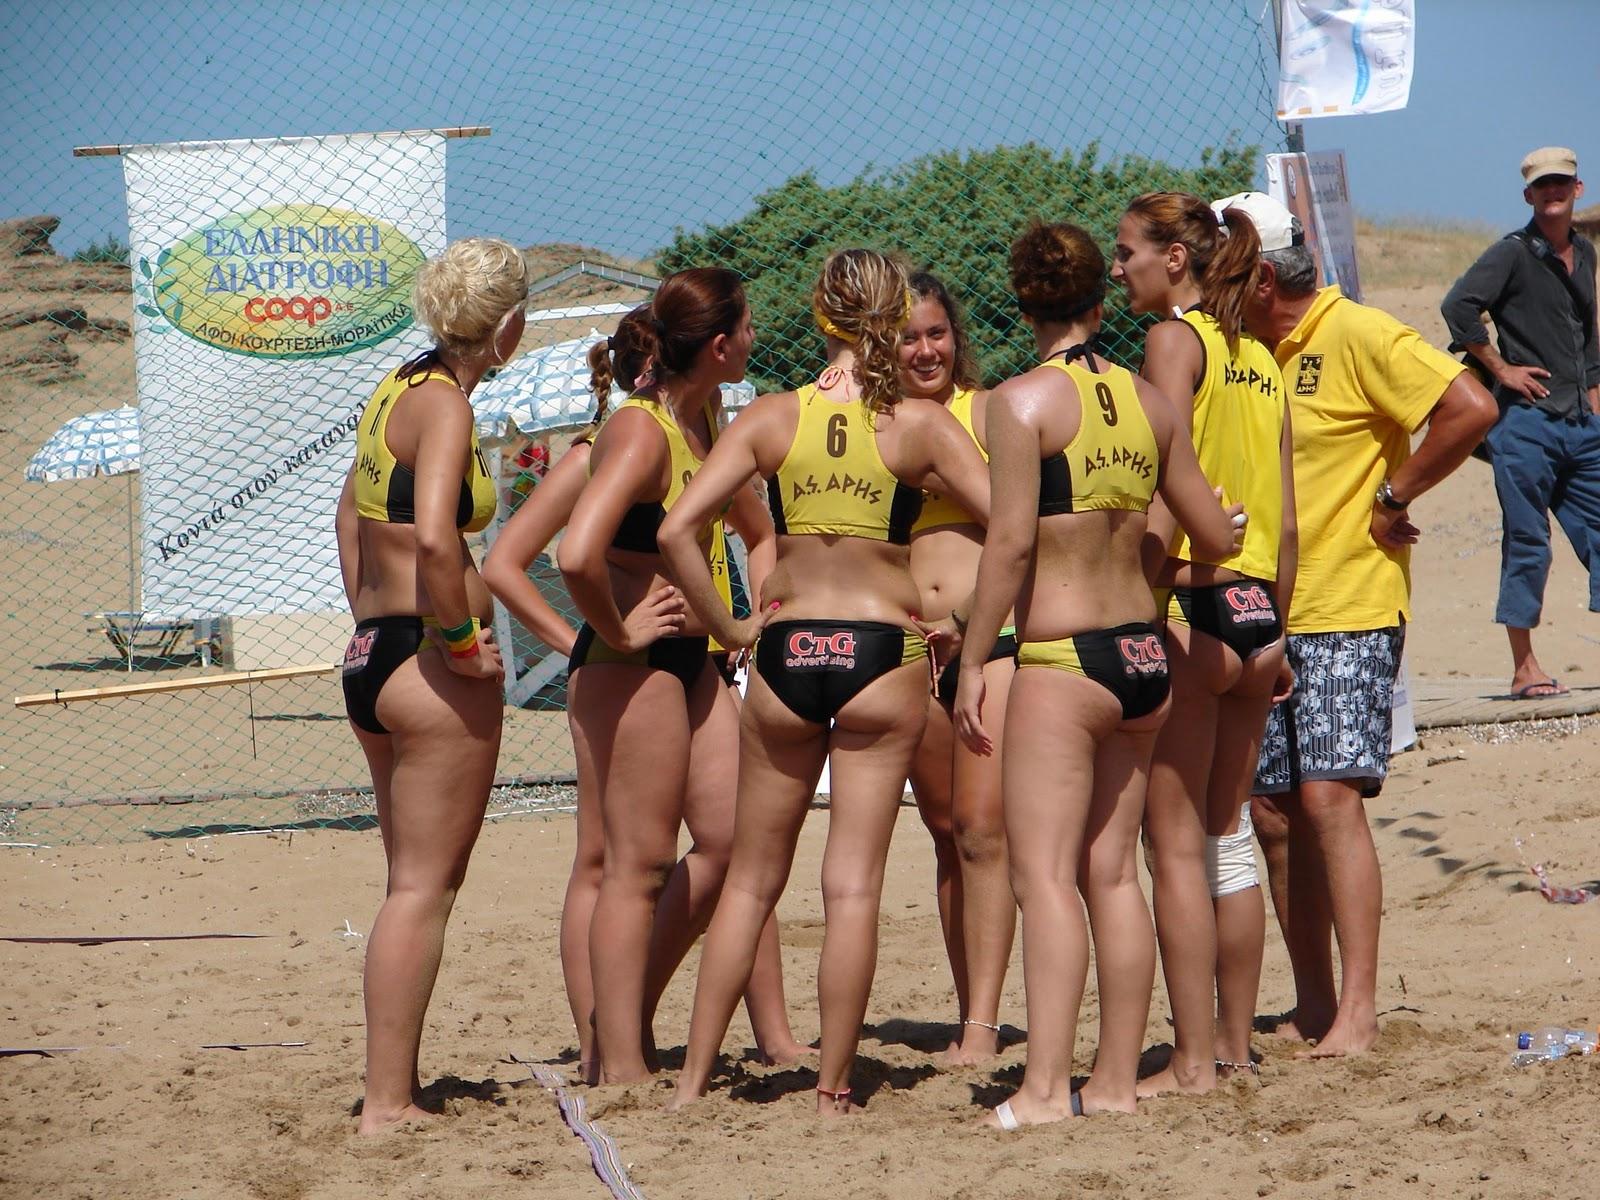 Volleyball Girls Pictures Beach Volleyball Girls Photos-7113